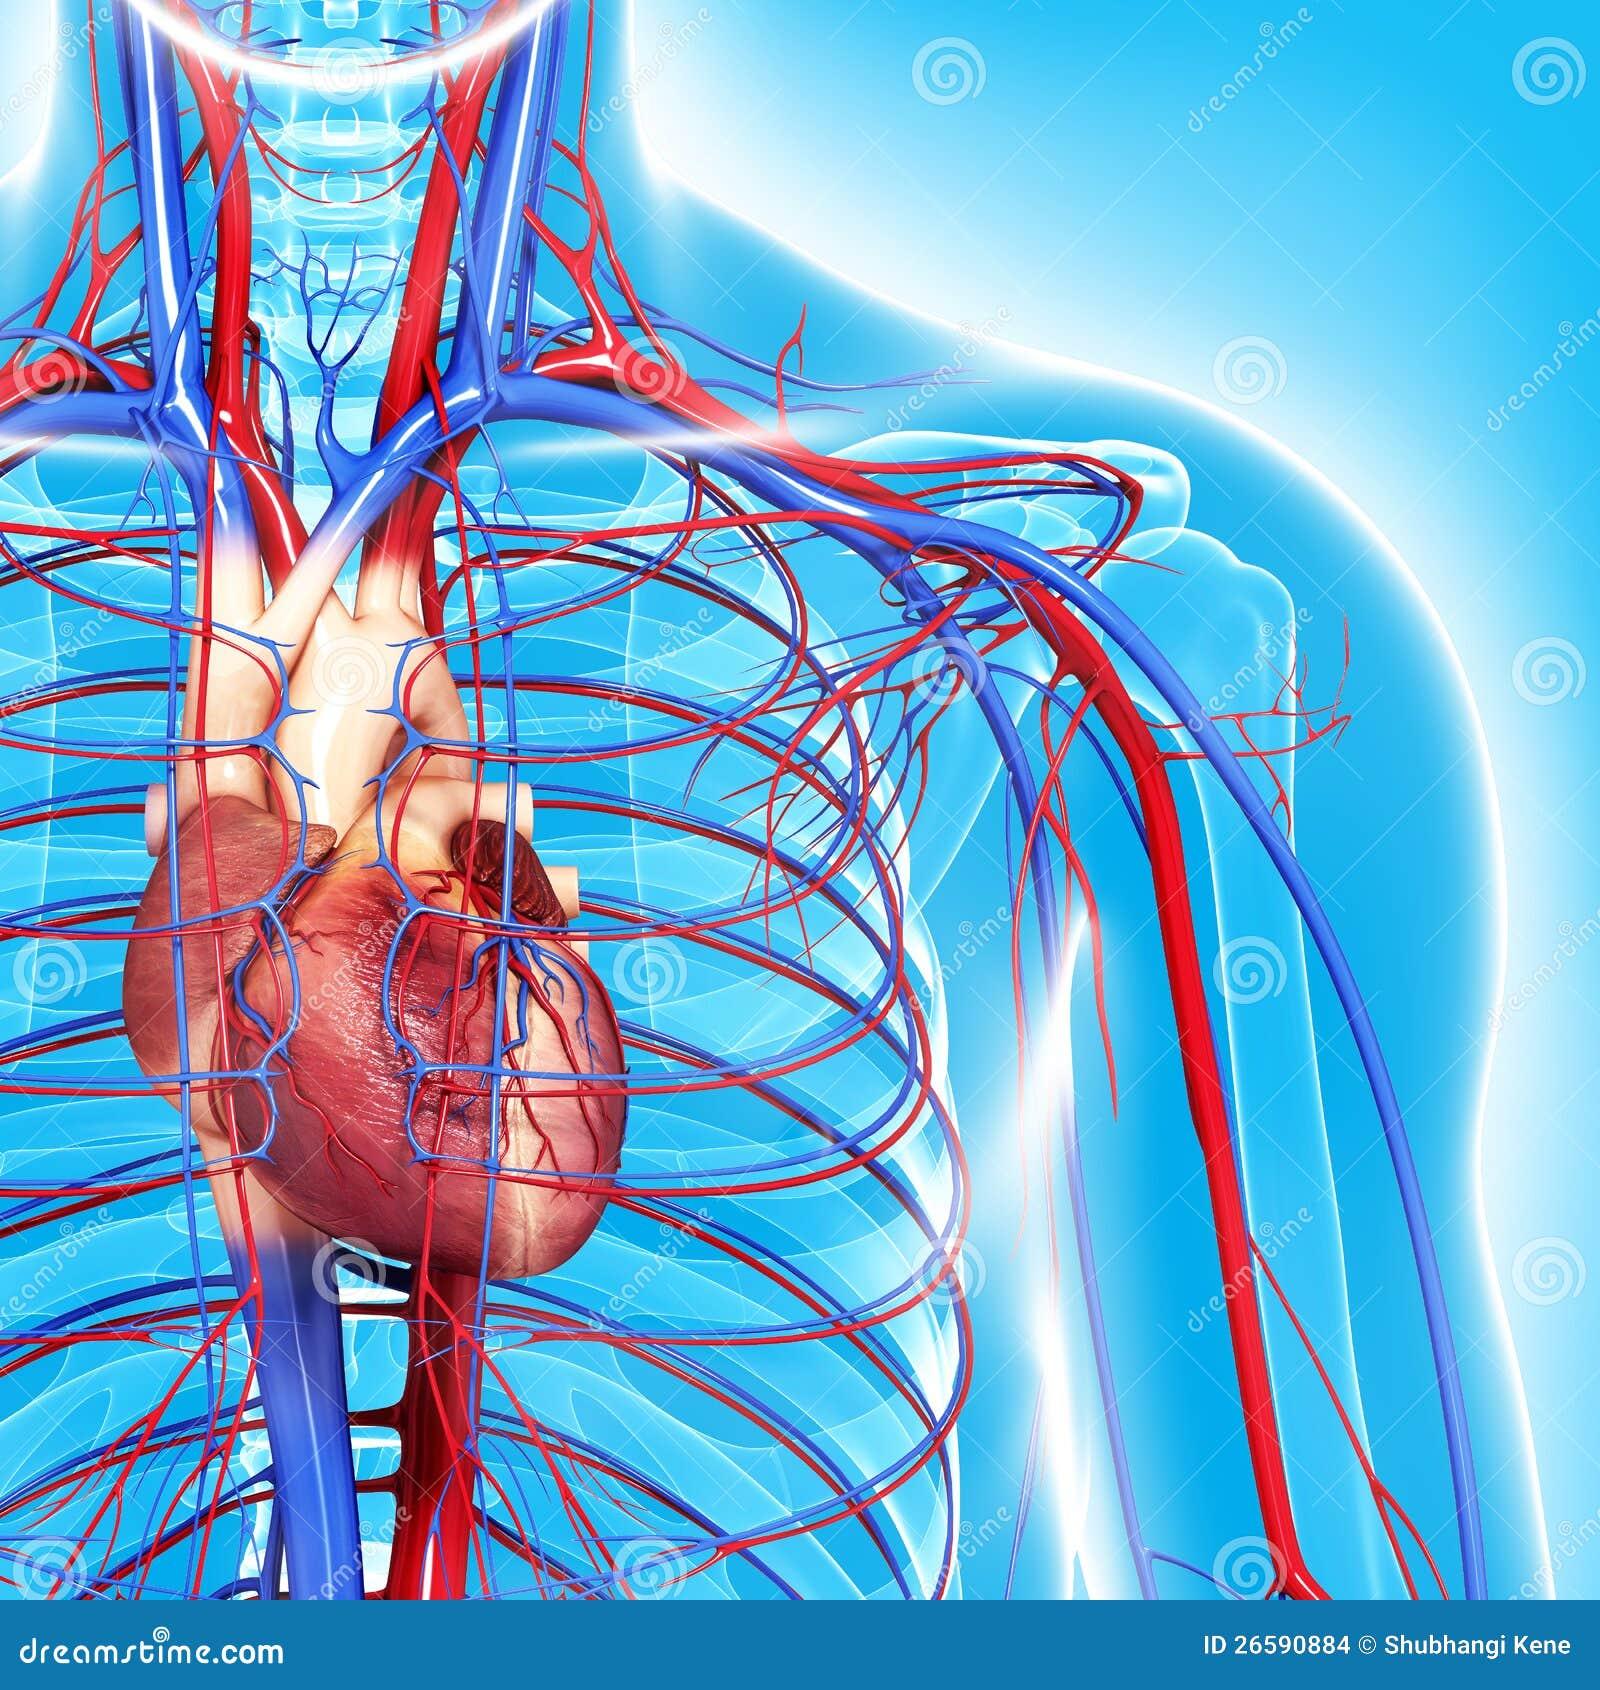 Circulatory system of half body highlights heart